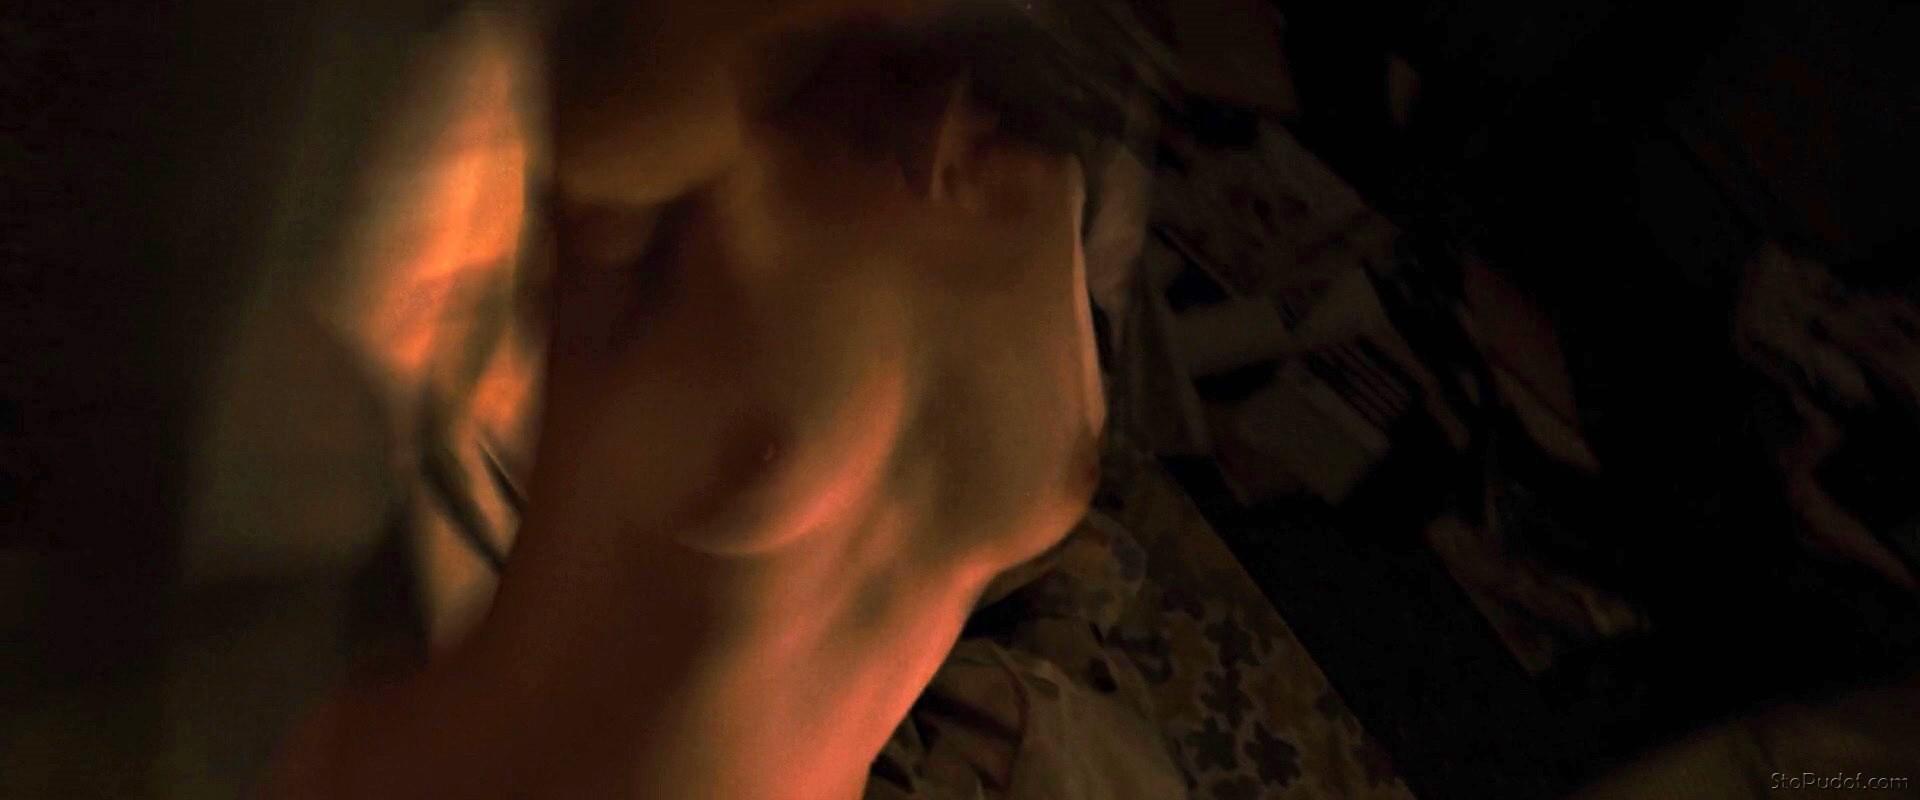 helena bonham carter naked dildo pictures